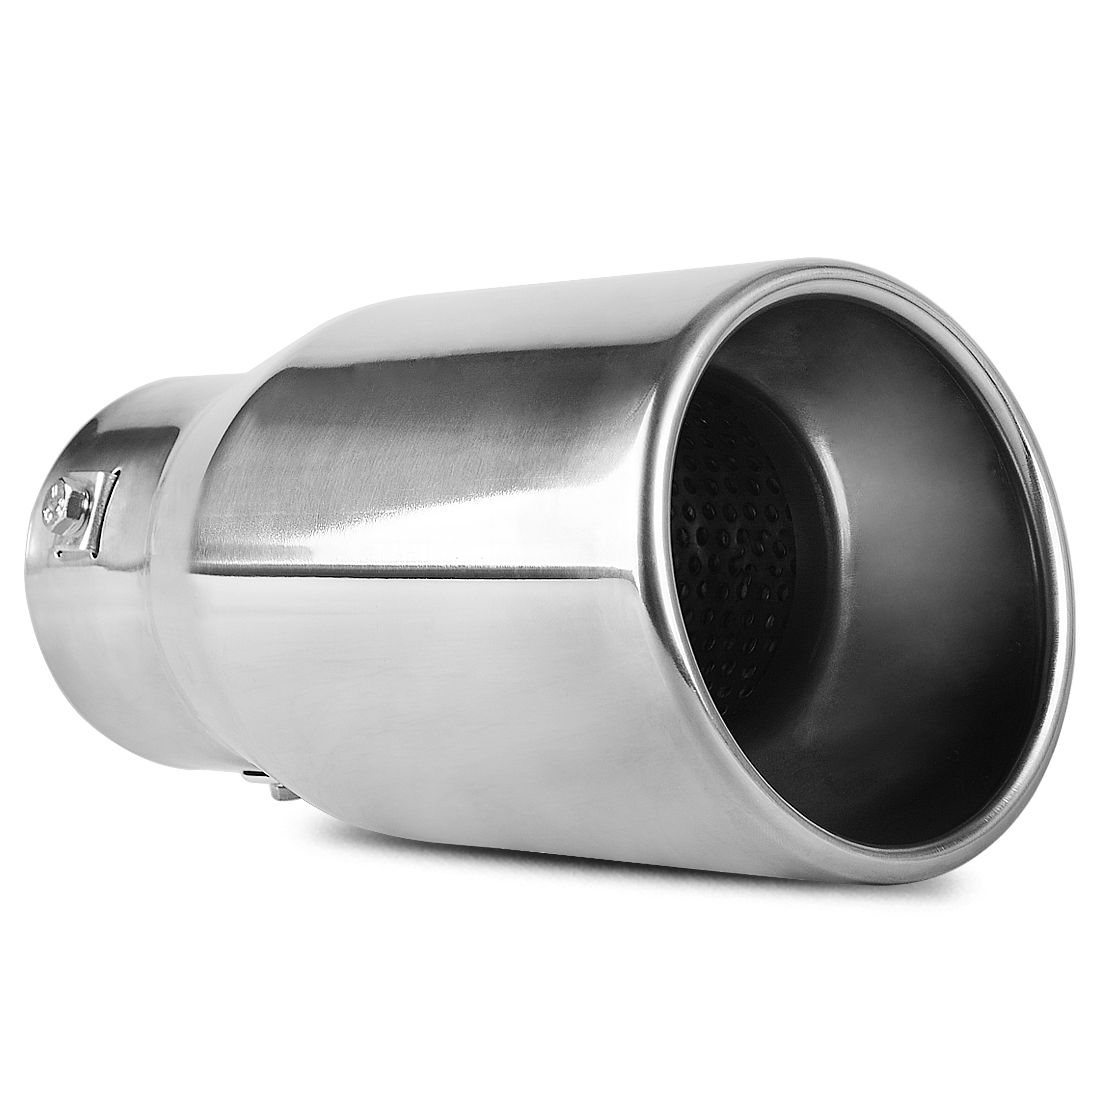 "DC Sports Universal Bolt On Stainless Steel Exhaust Muffler Tip 3 75/"" x 9/"""